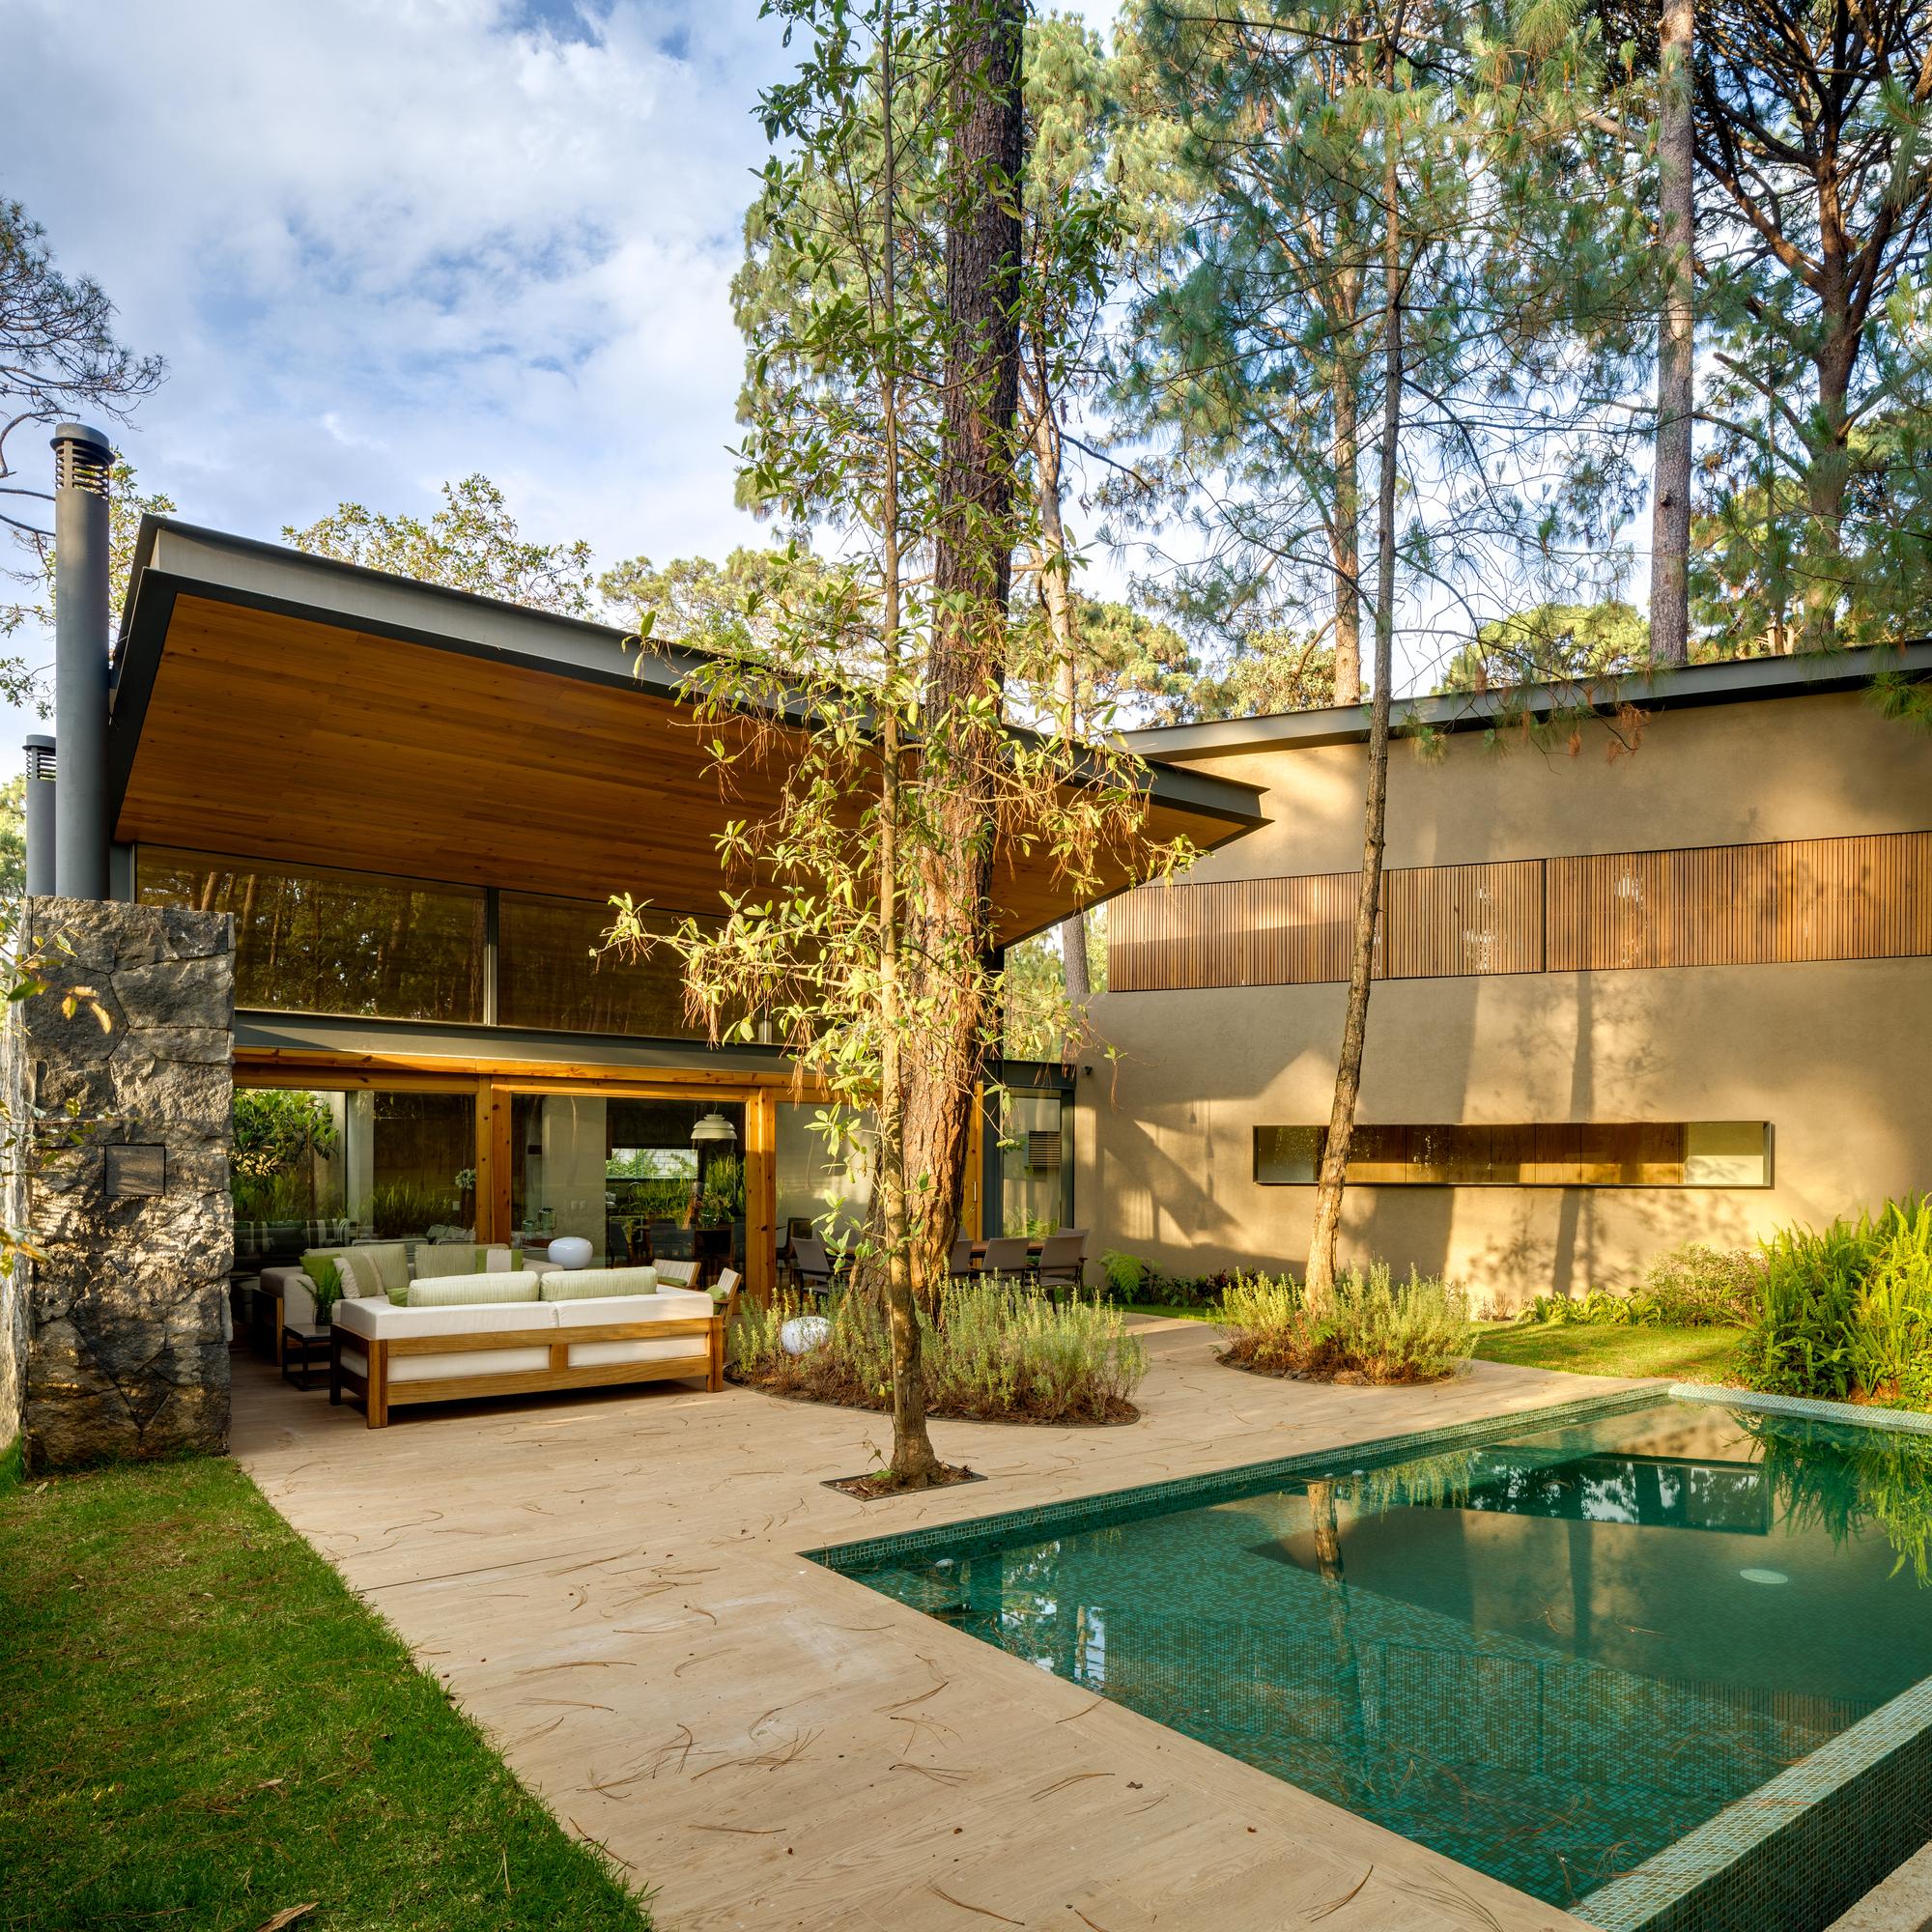 Galer a de cinco casas weber arquitectos 2 - Arquitectos madrid 2 0 ...